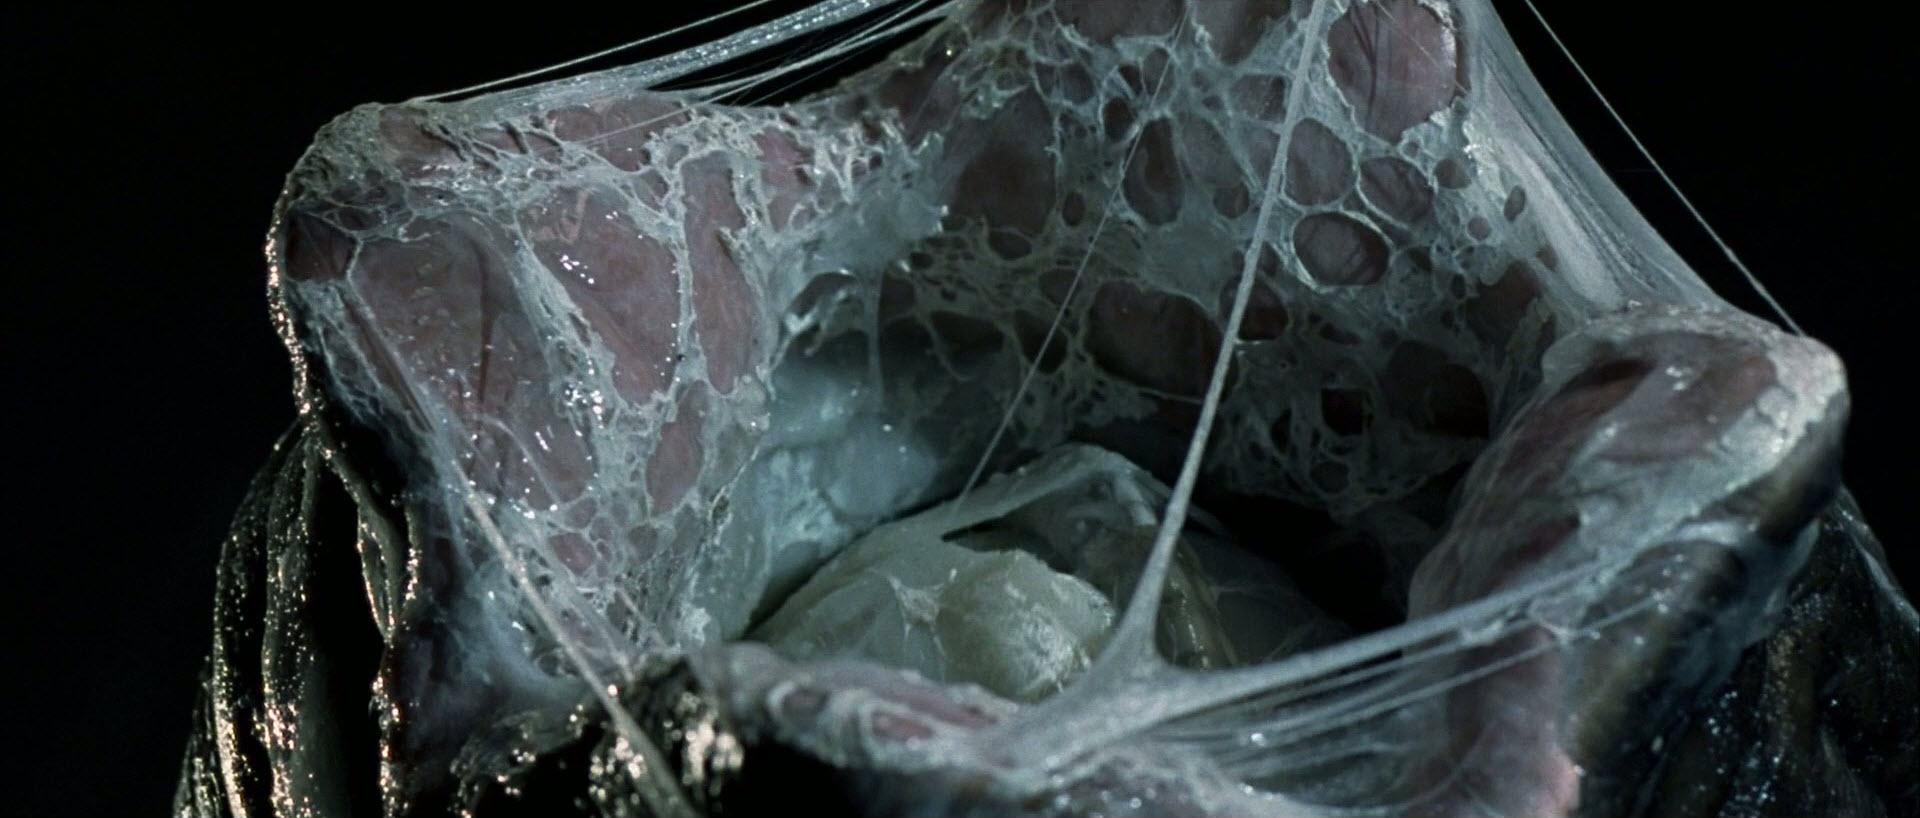 11. Film still from  Alien   Scott, Ridley, director.  Alien . 1979.